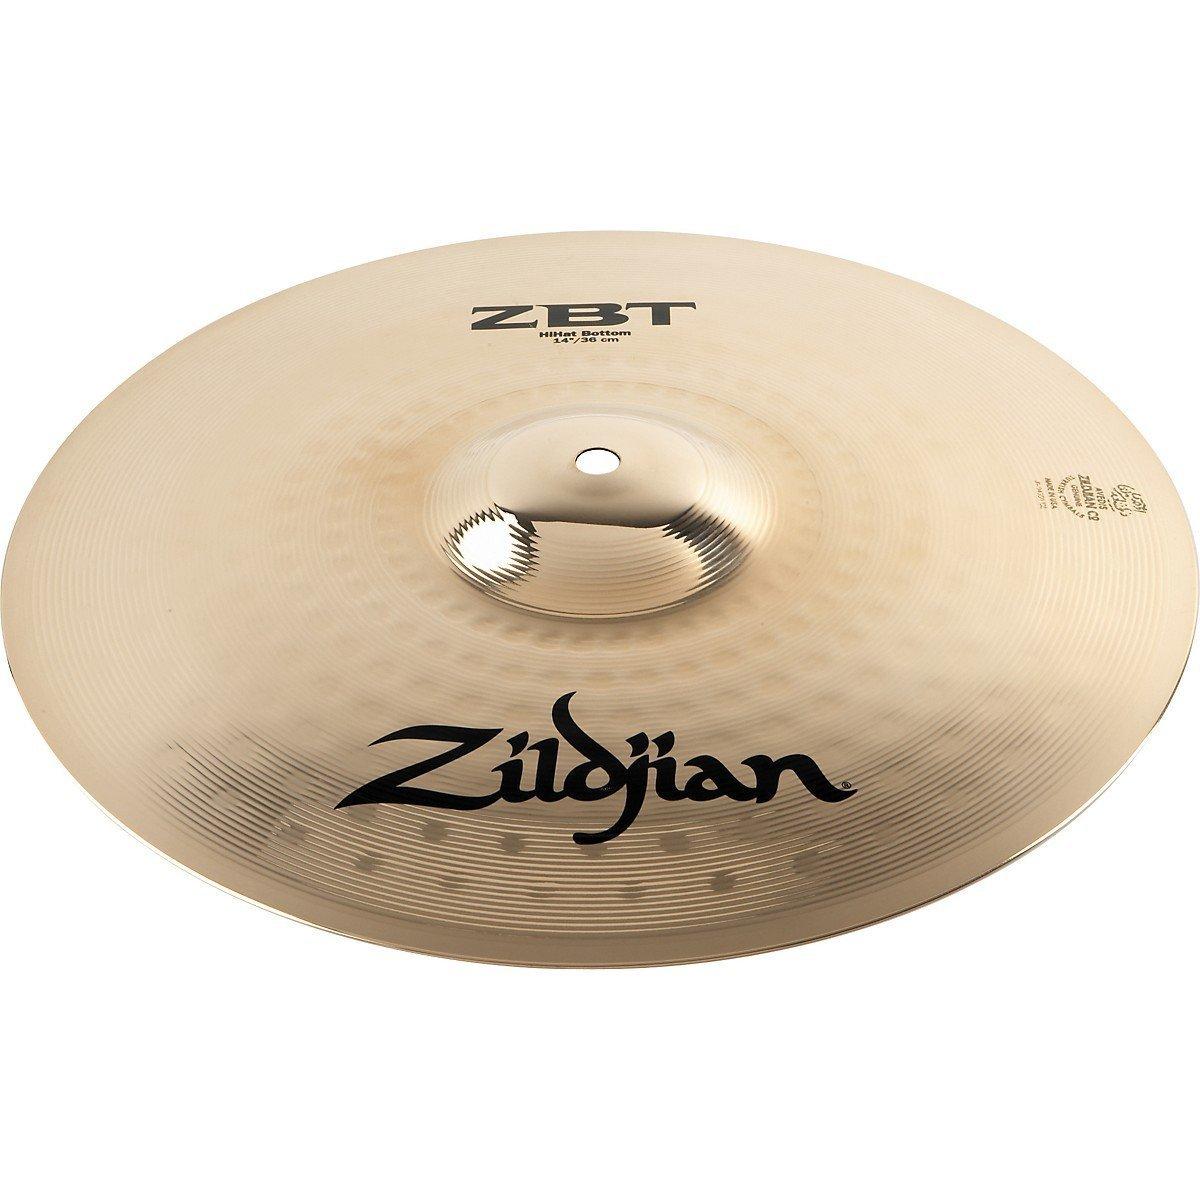 Zildjian ZBT 14'' Hi Hat Bottom Cymbal by Avedis Zildjian Company